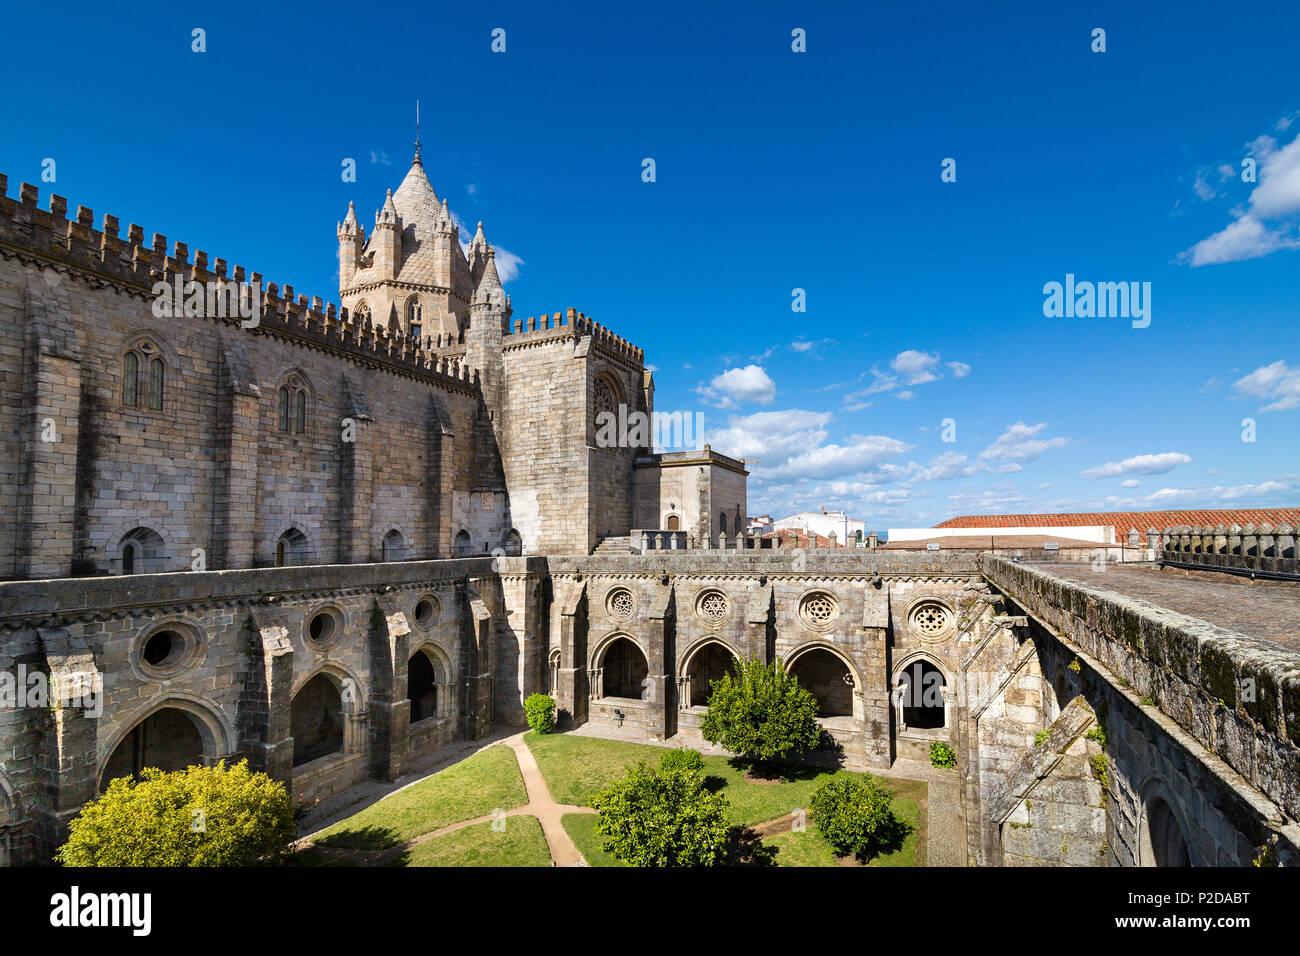 Cloister, cathedral, Evora, Alentejo, Portugal - Stock Image